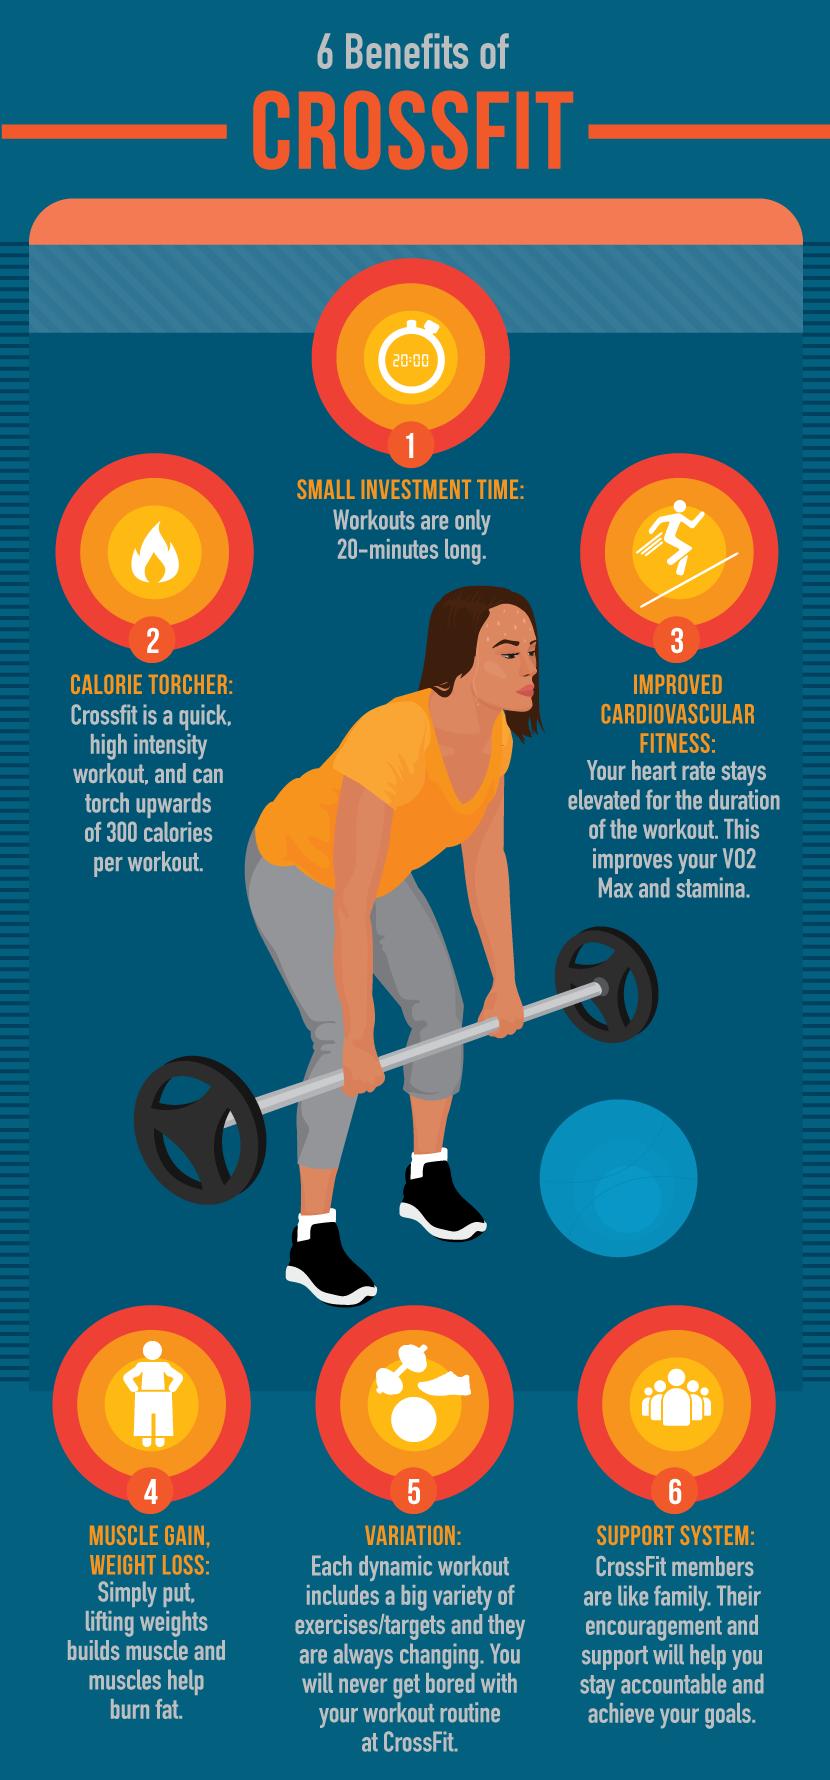 Benefits of CrossFit